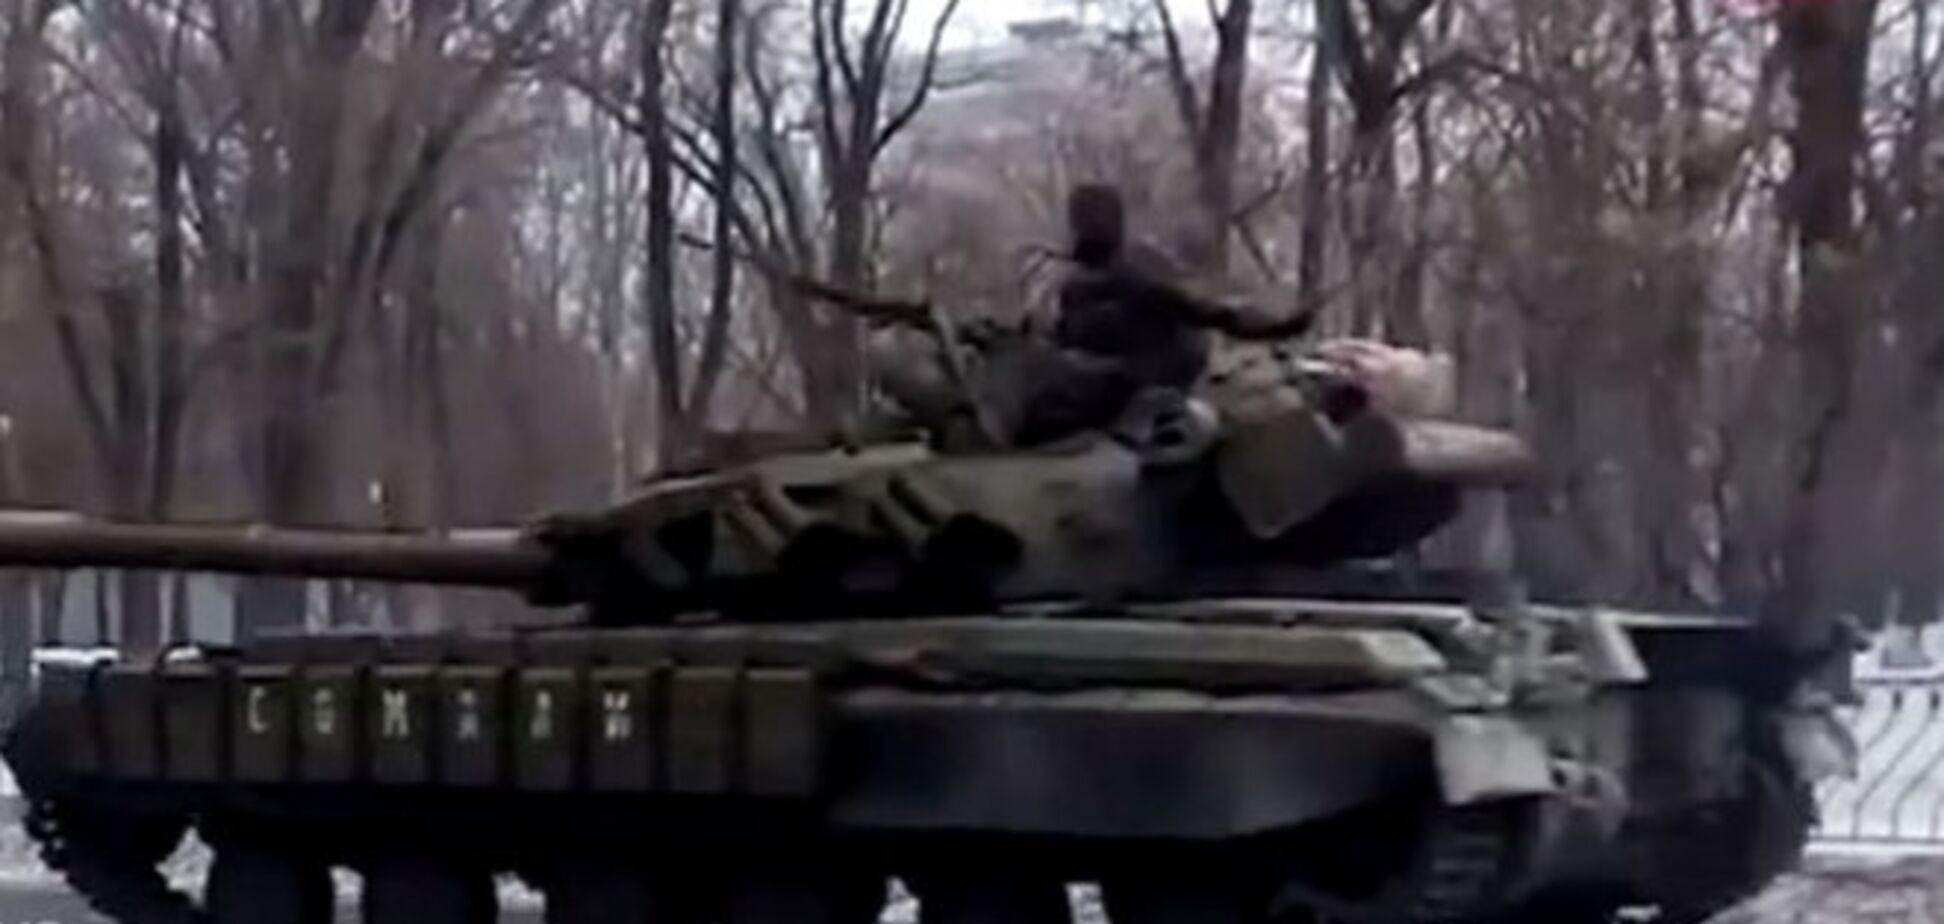 Колонна бронетехники террористов движется на Пески: опубликовано видео